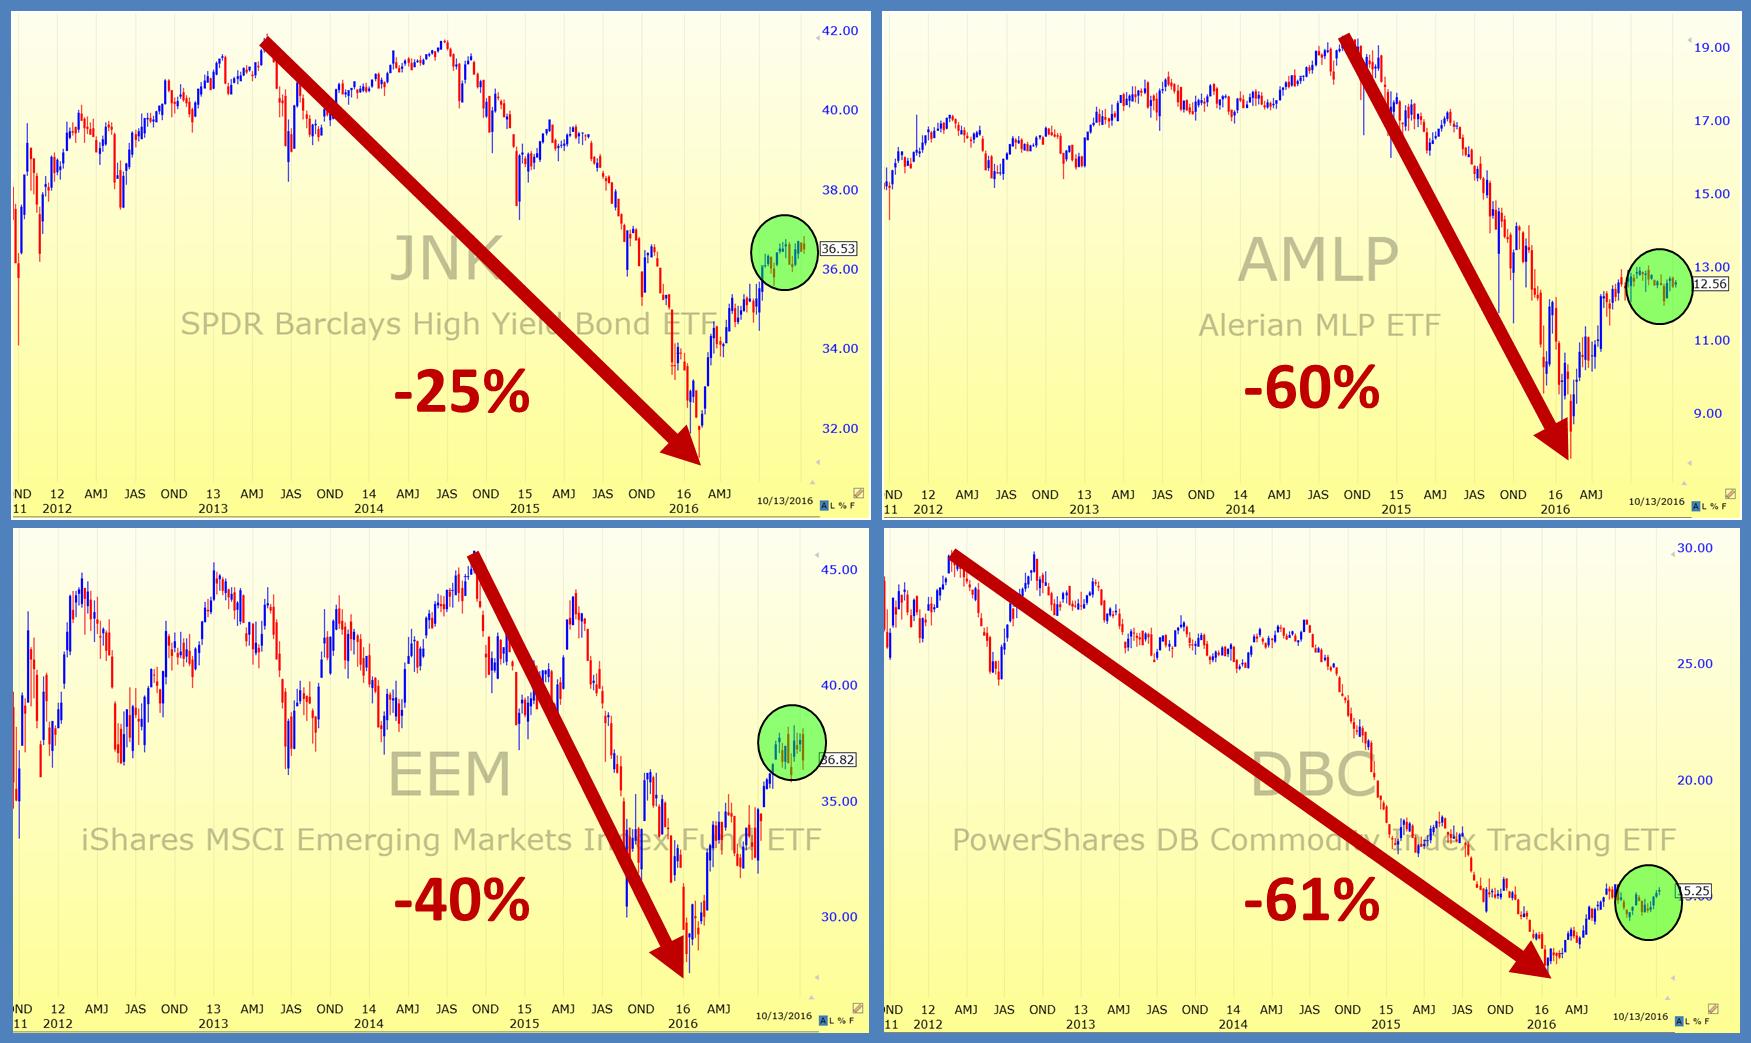 hf-eblast-chart-bubbles-bursting-10-14-16